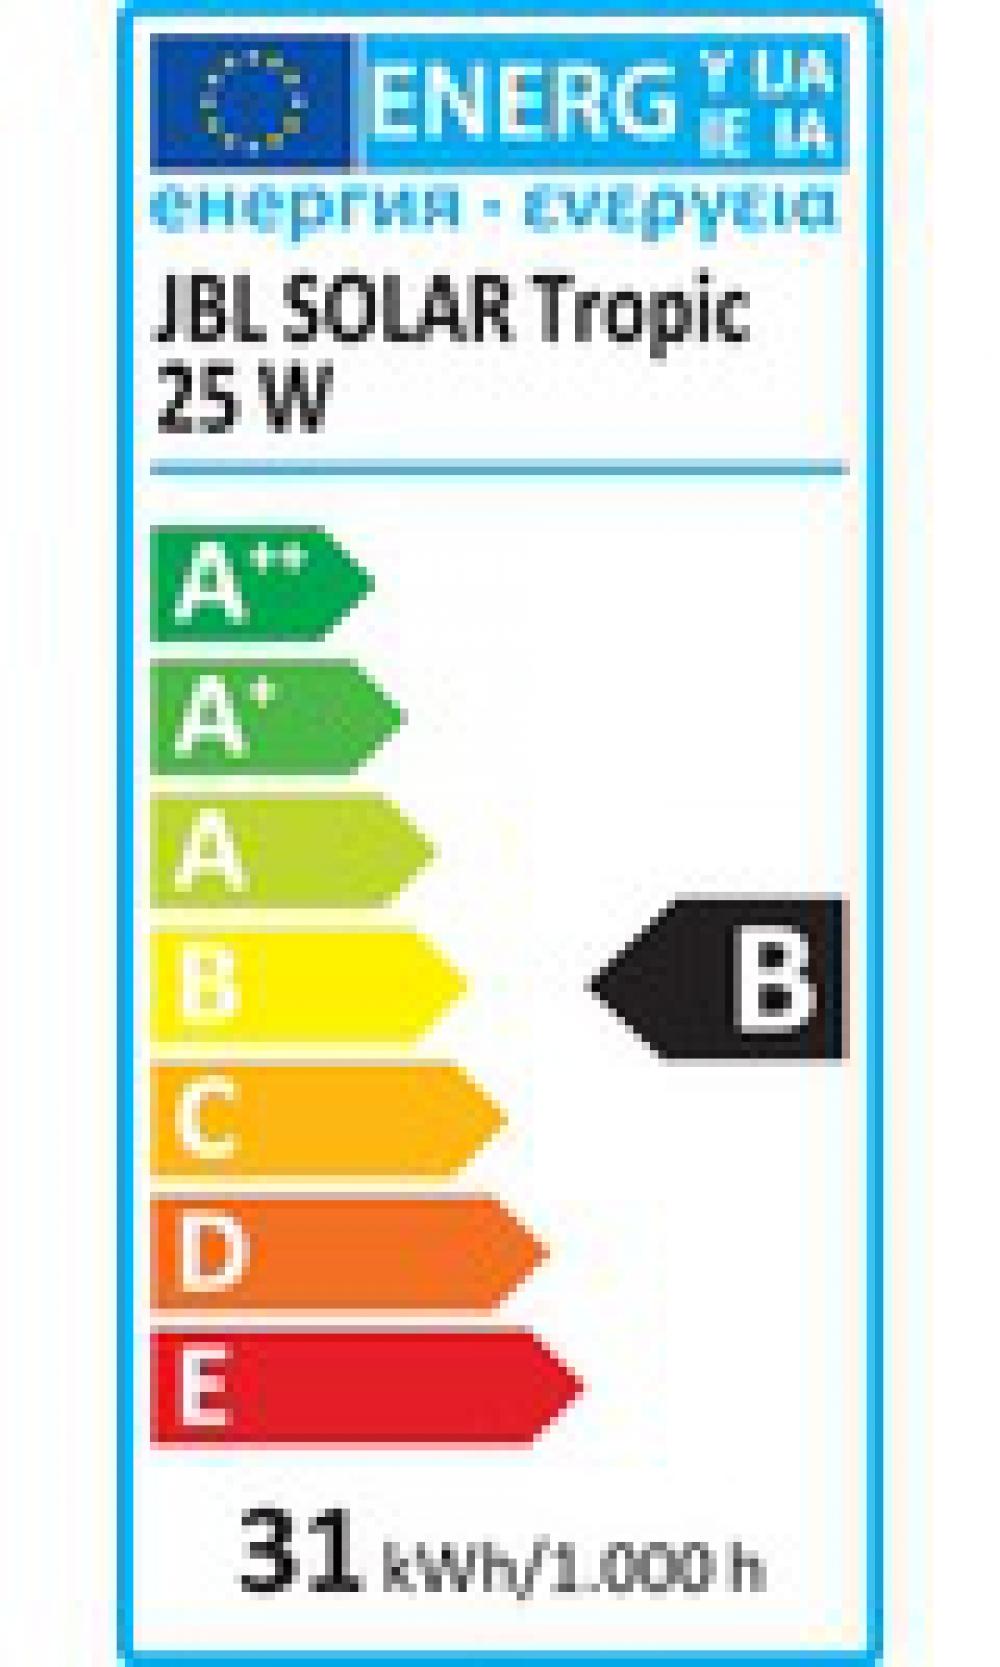 JBL SOLAR TROPIC 25 Вт, 742 мм. Лампа полного спектра для аквариумных растений - 1